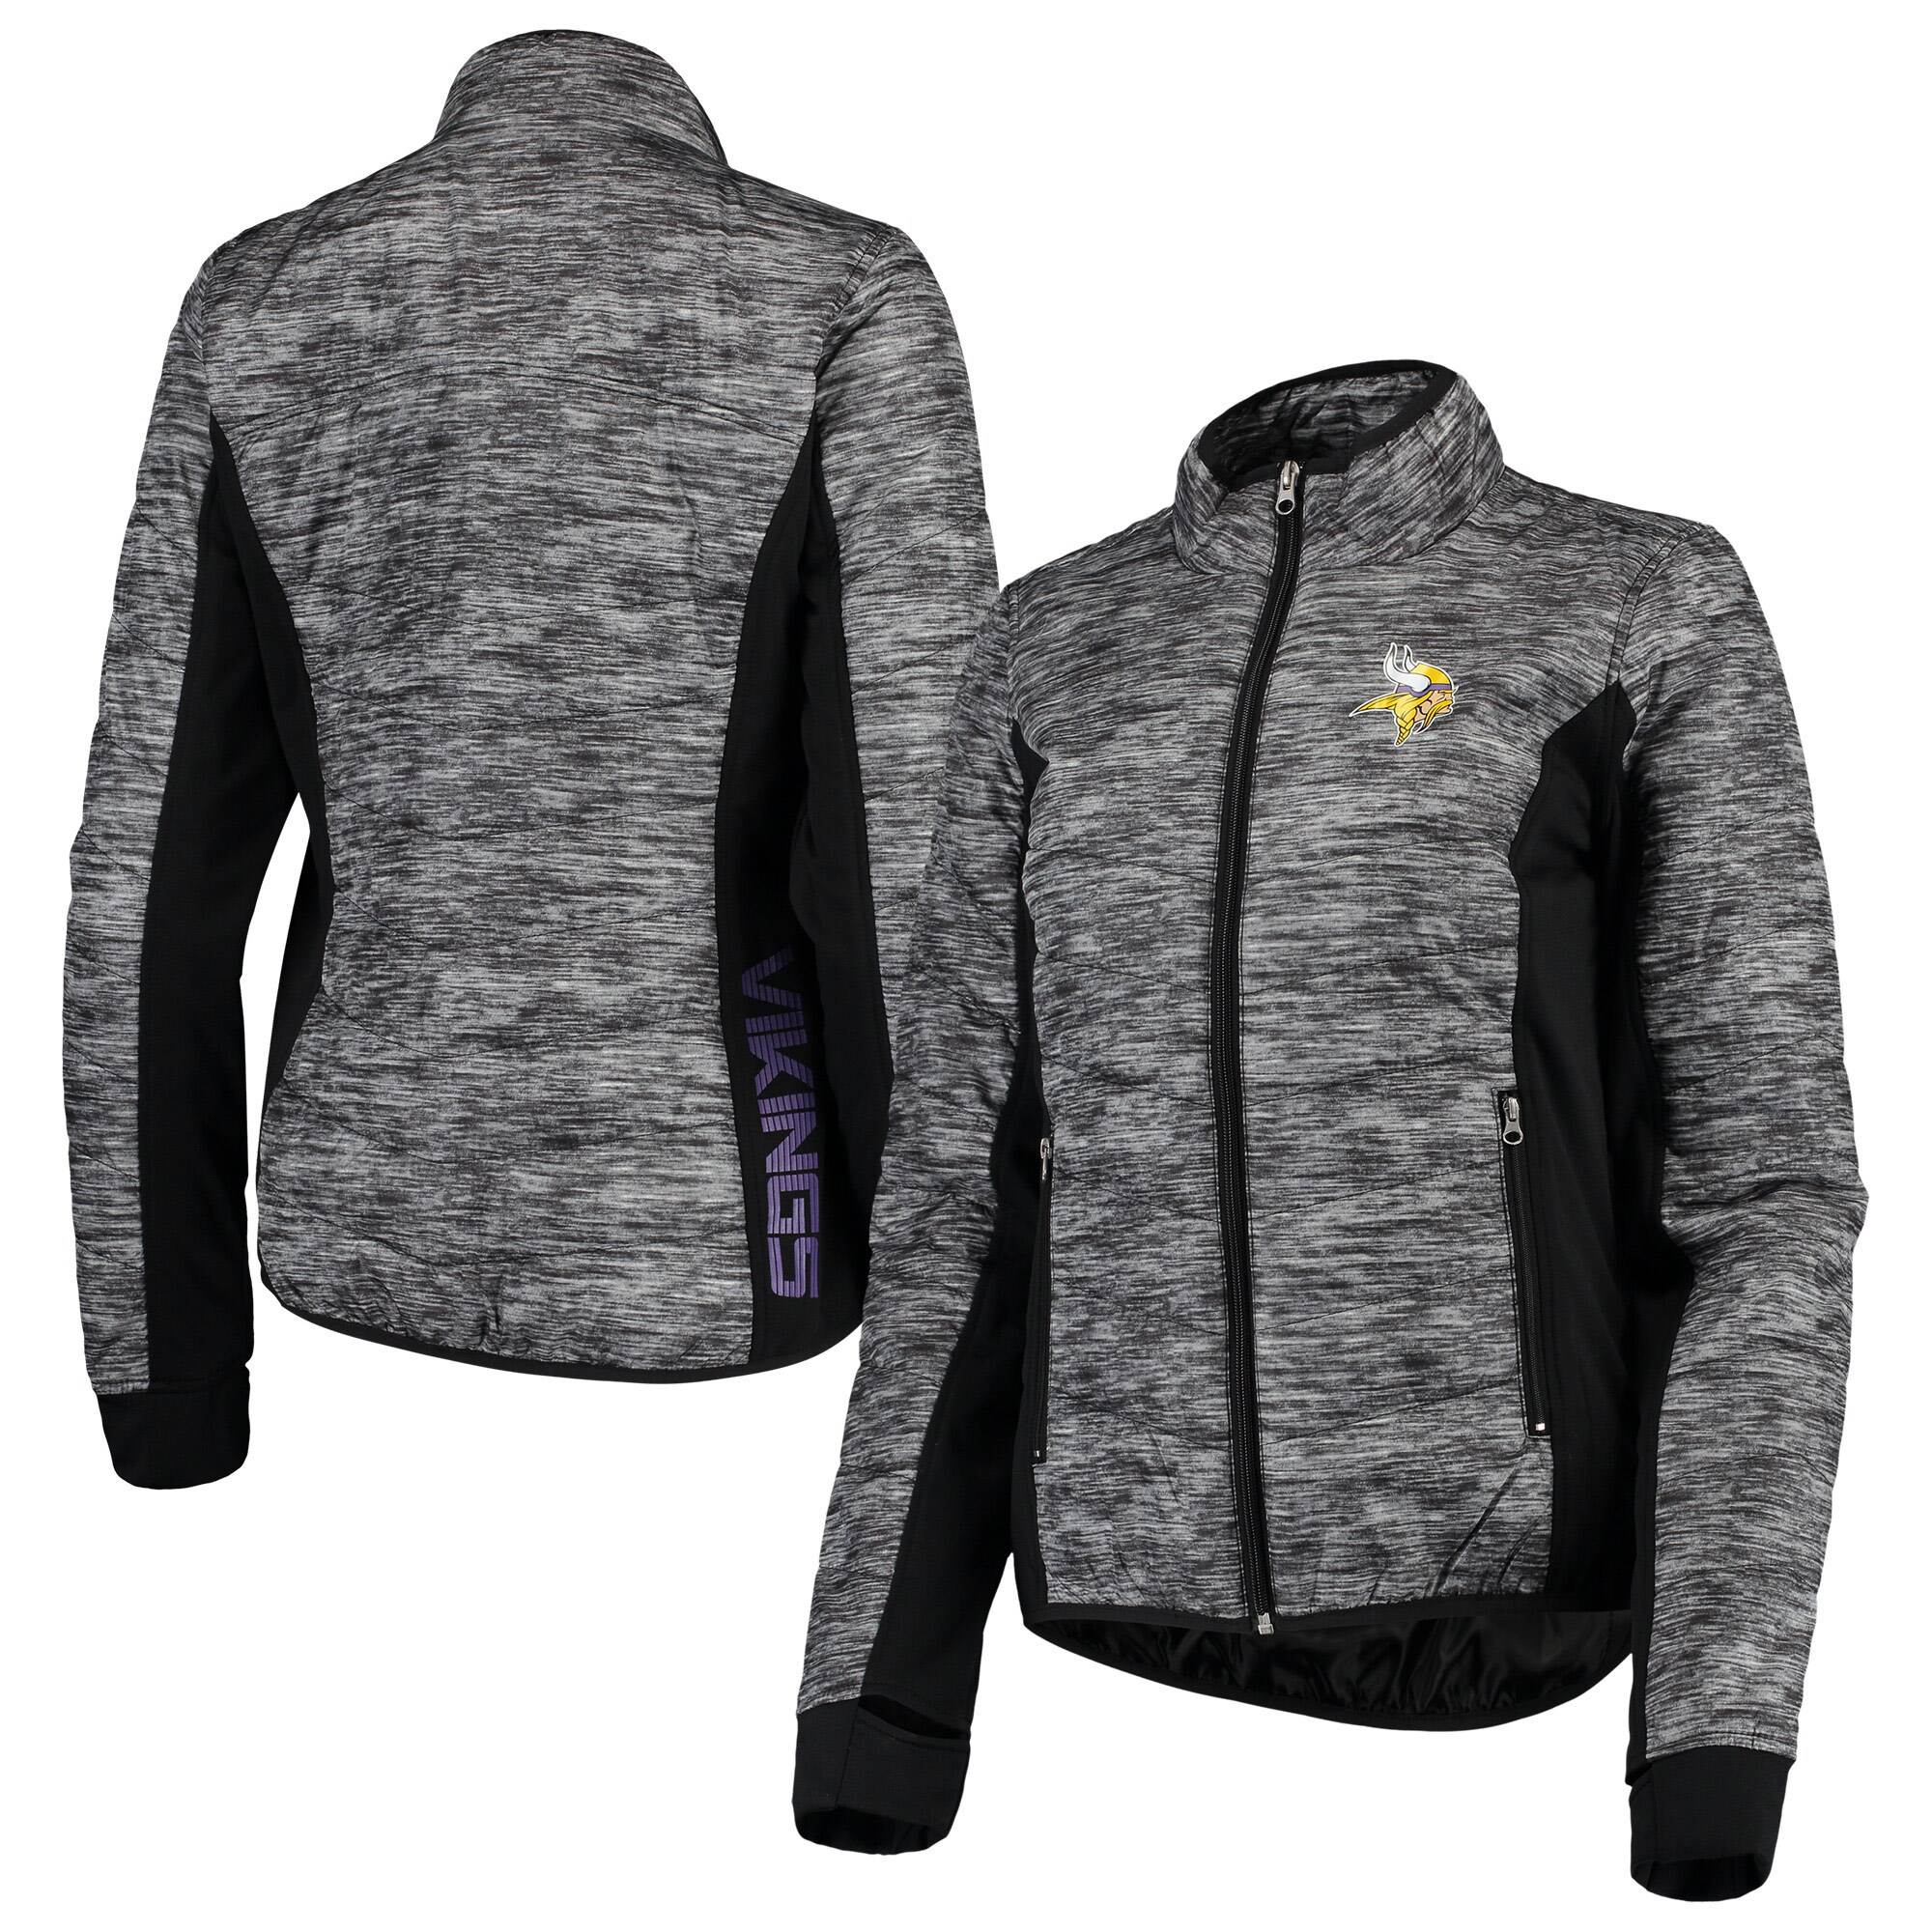 Minnesota Vikings G-III 4Her by Carl Banks Women's Huddle Full-Zip Jacket - Black